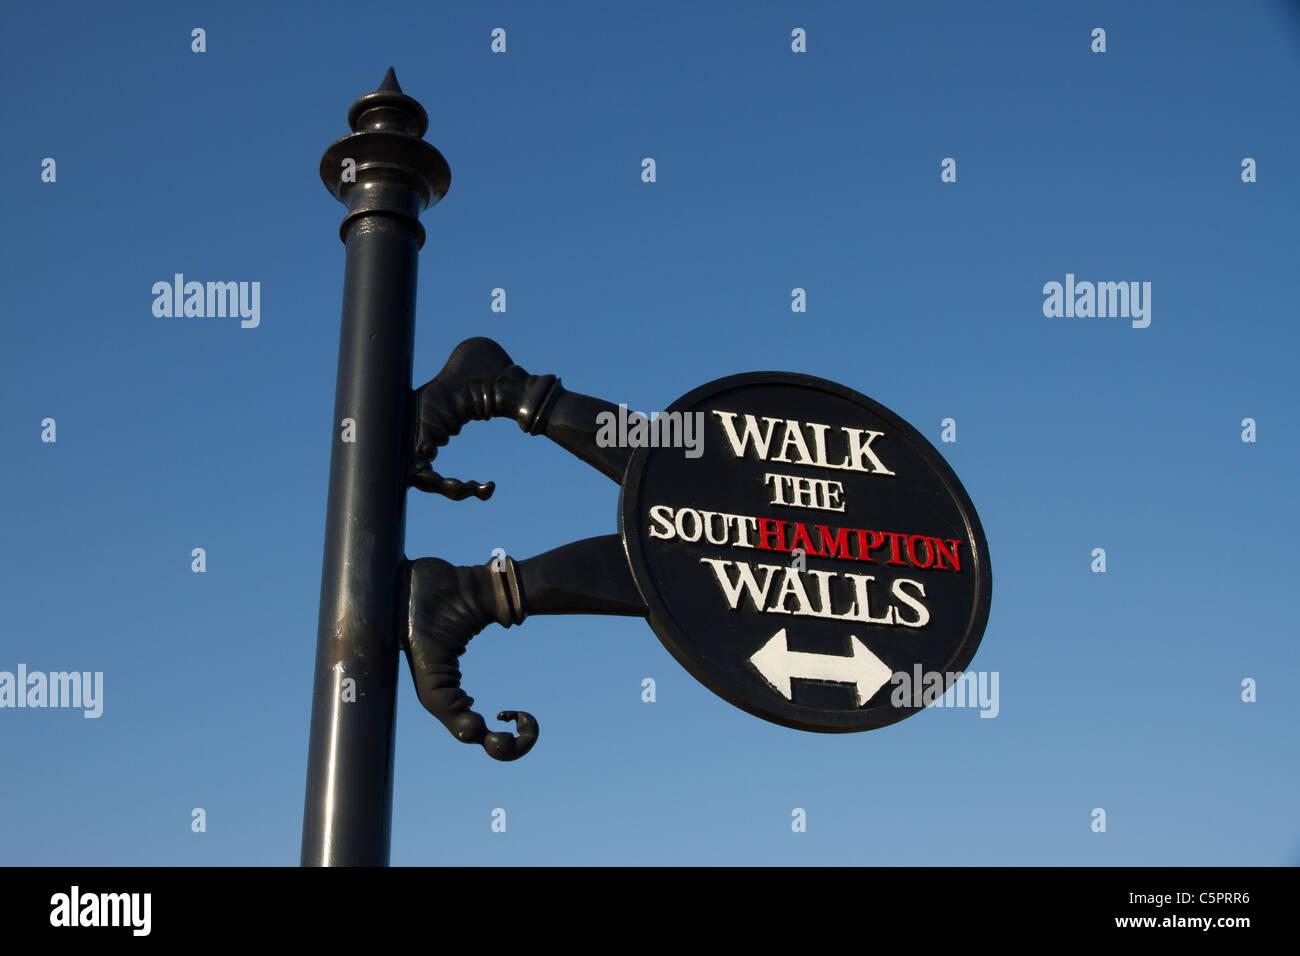 Walk the Southampton Wall sign, Hampshire , England - Stock Image